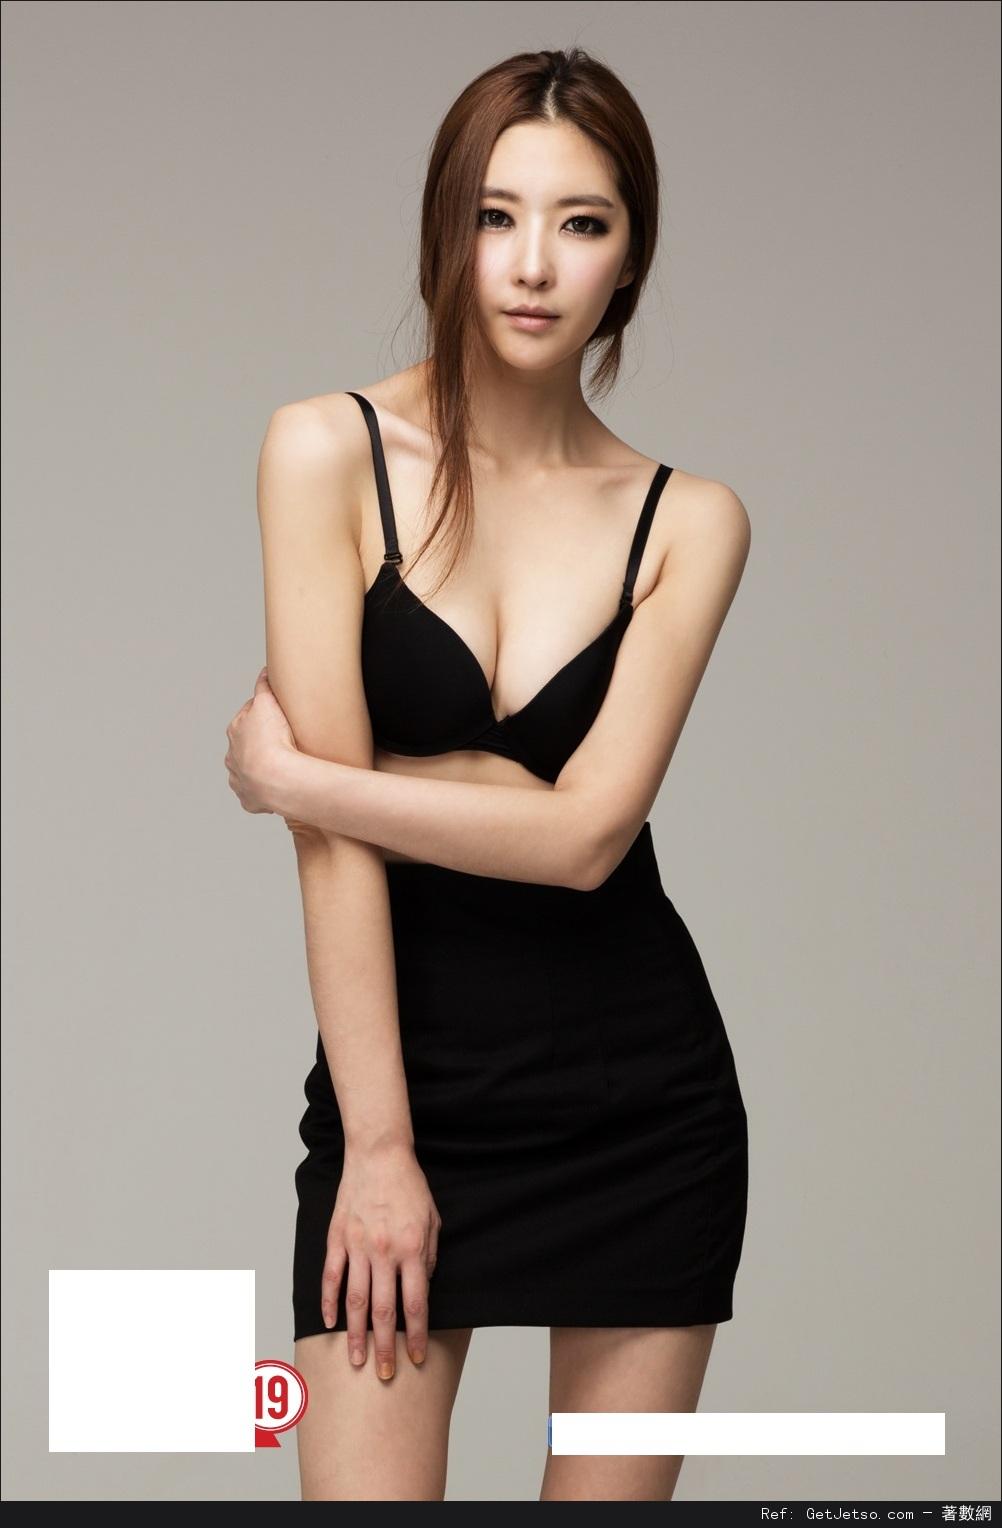 Hot Red - Kim Yoo Yeon ~ Cute Girl - Asian Girl - Korean